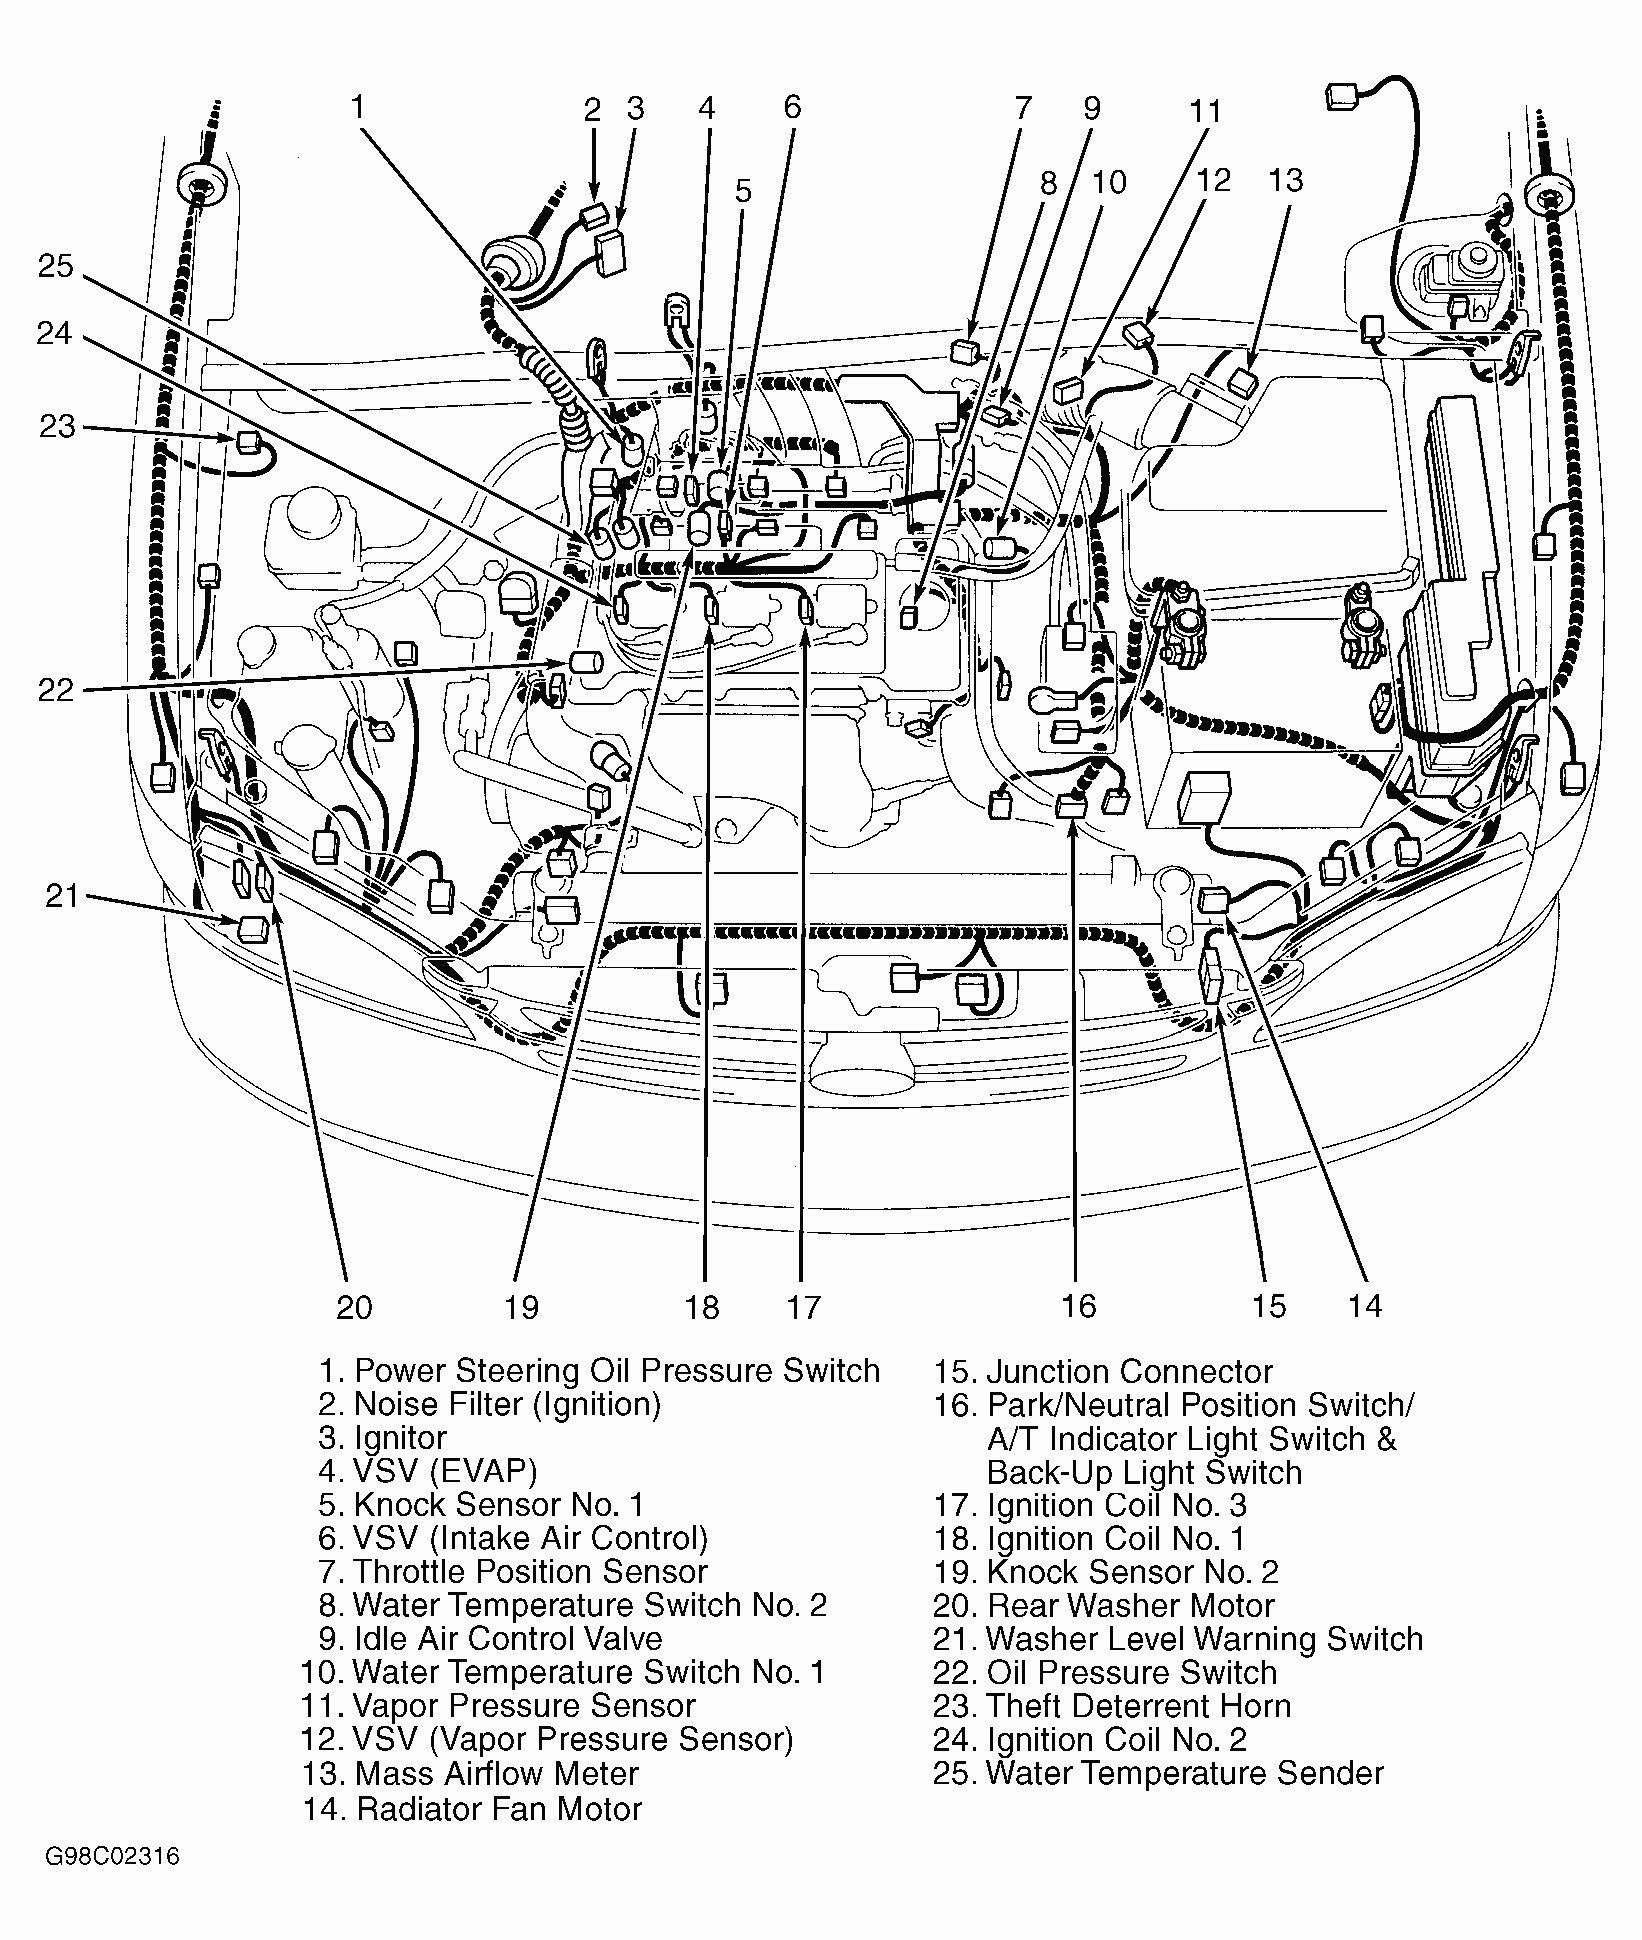 2005 Toyota Sienna Engine Diagram In 2021 Engine Diagram Toyota Corolla Toyota Tundra